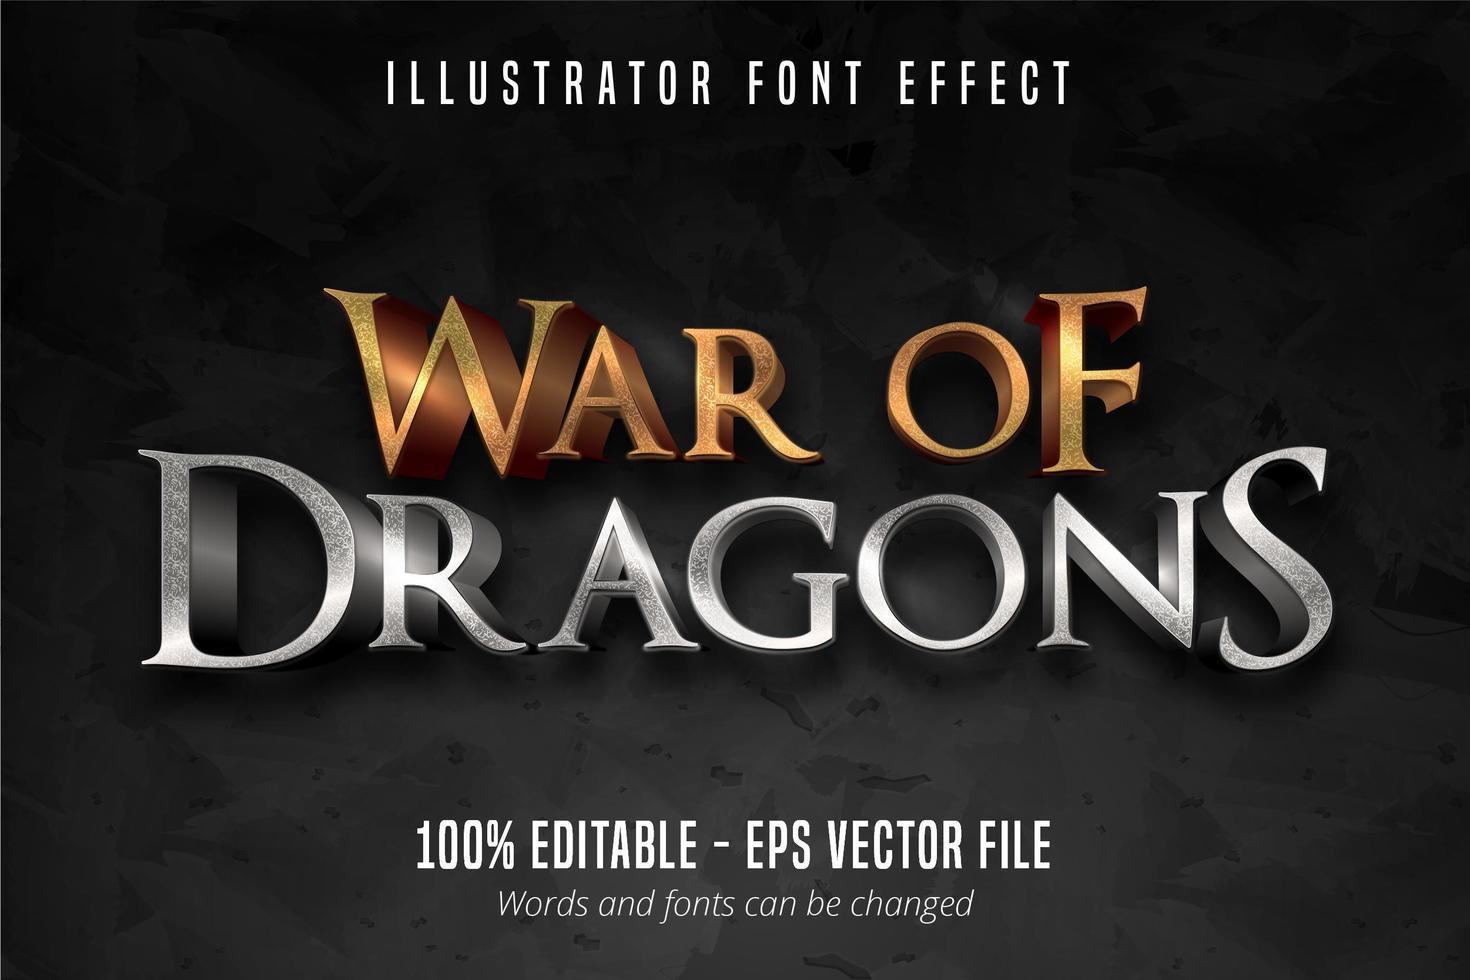 oorlog van draken tekst lettertype-effect vector